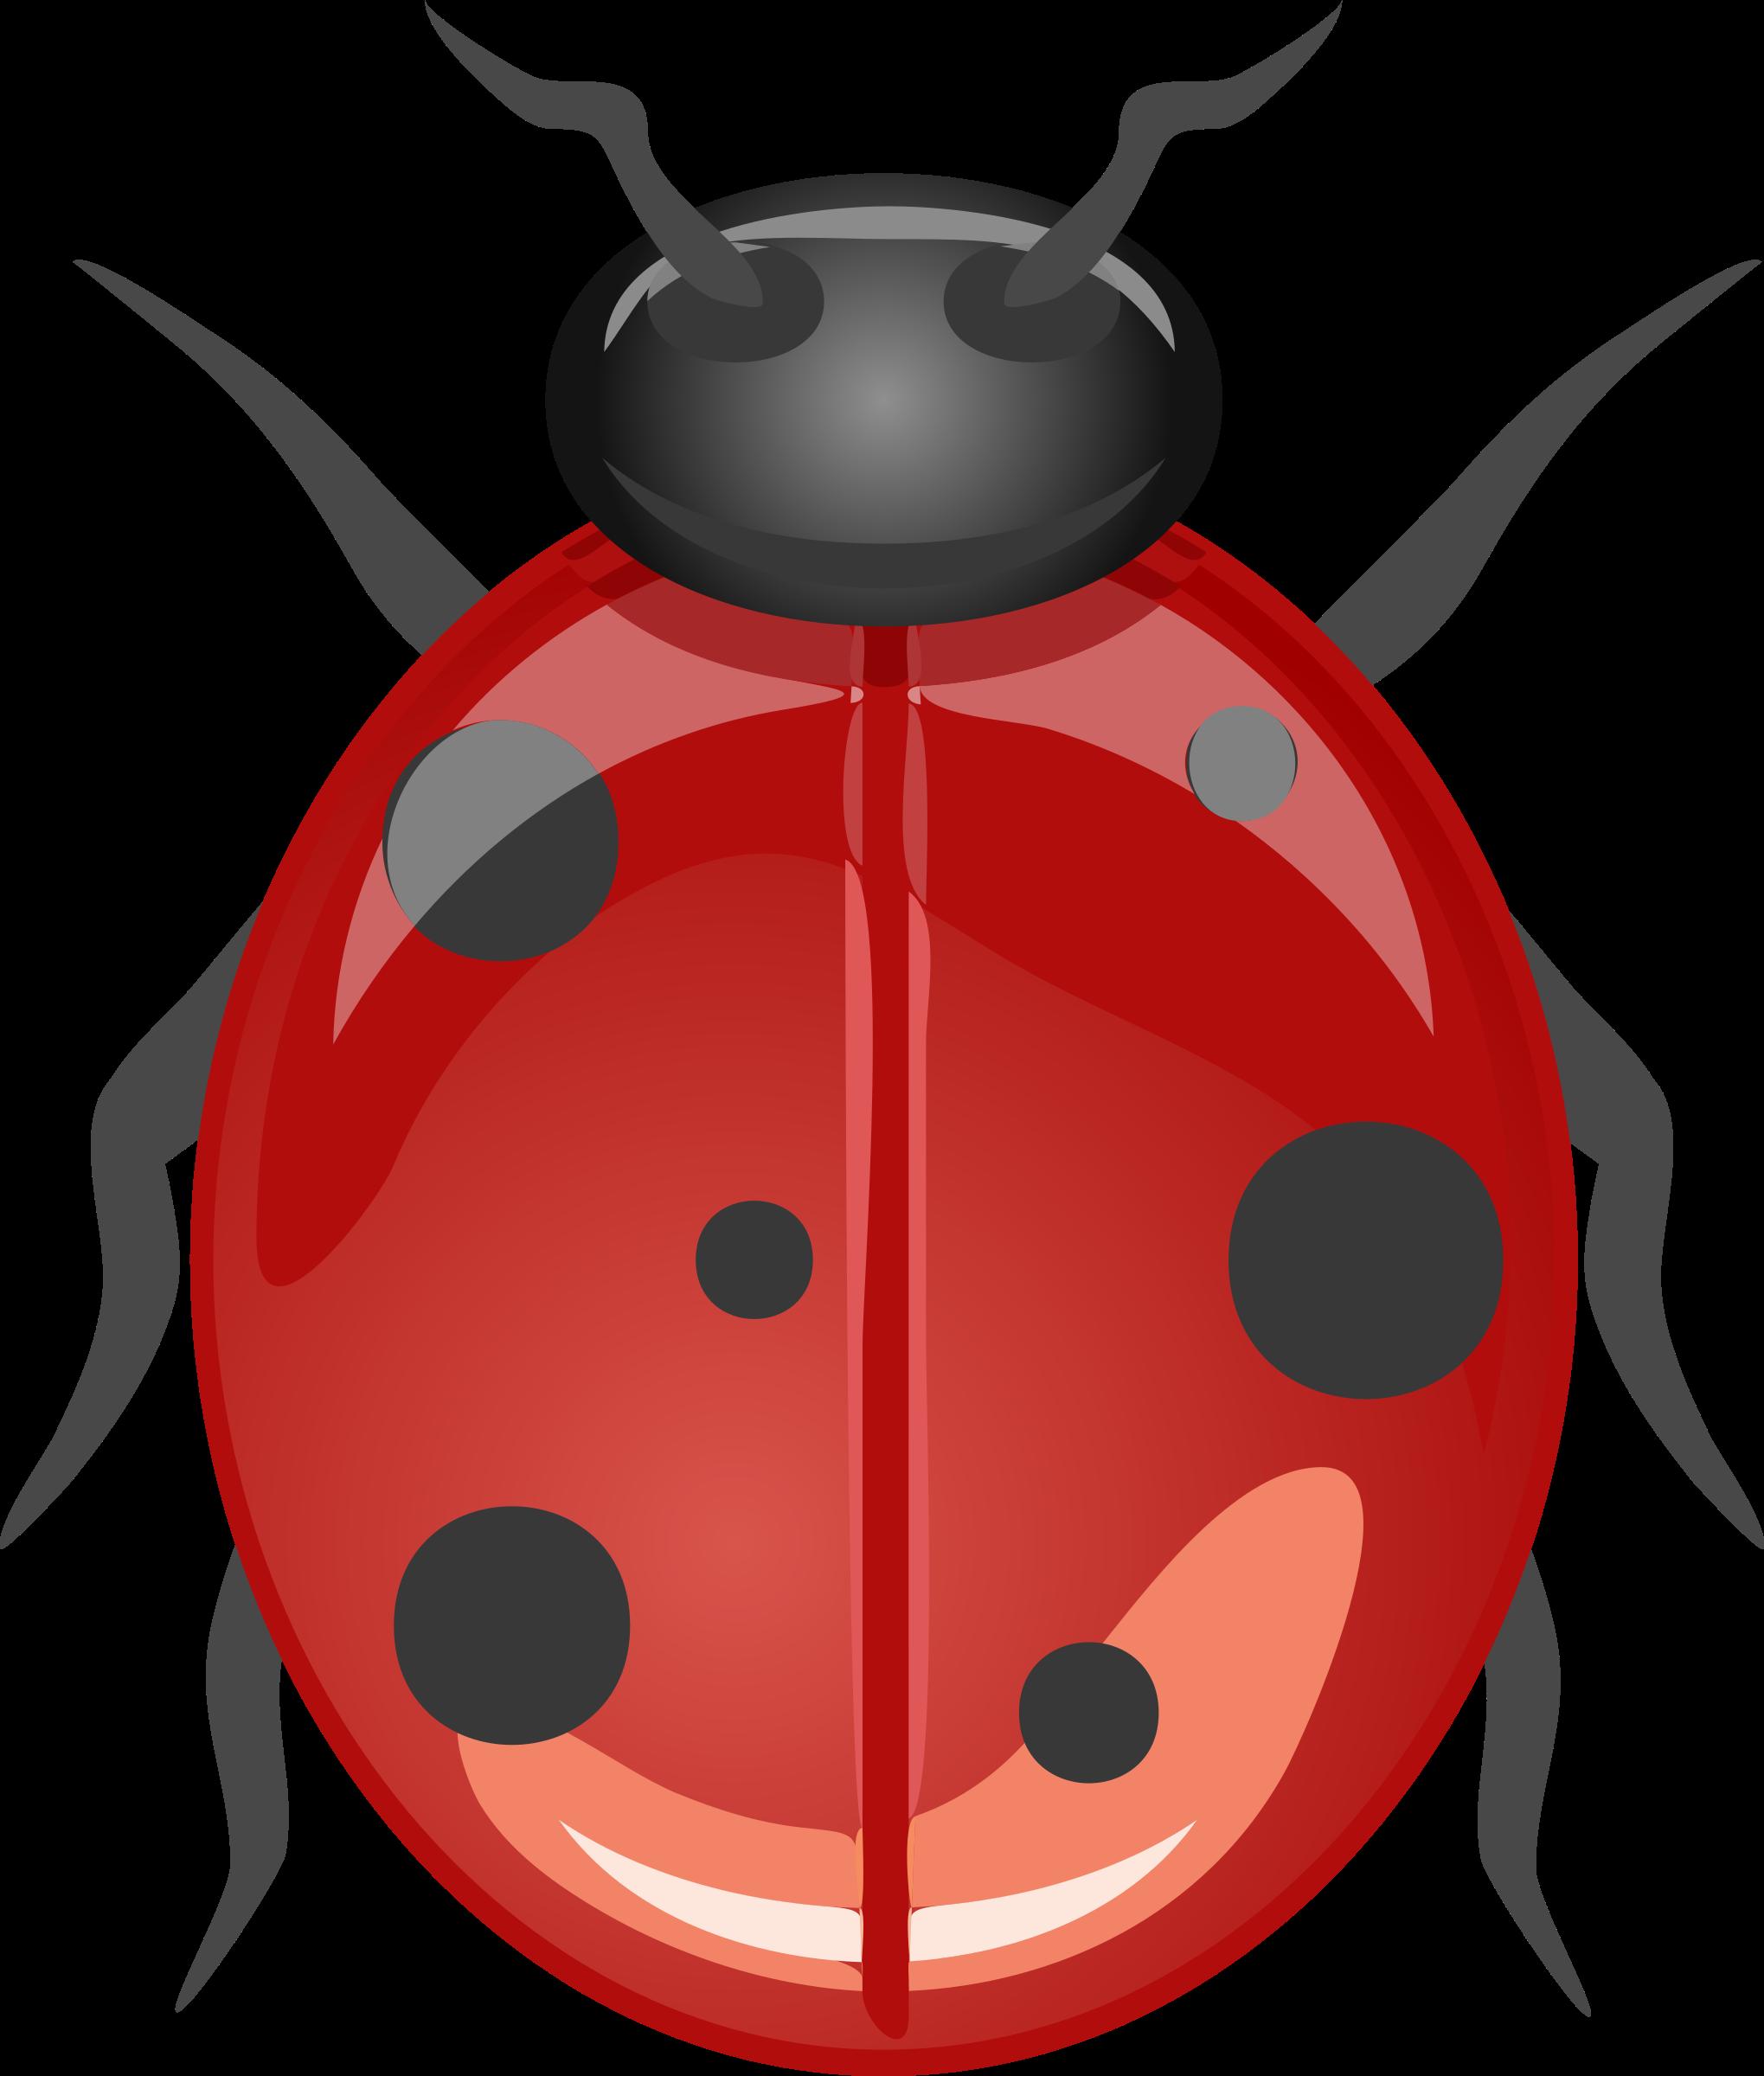 Ladybug clipart leaf clip art. Architetto coccinella big image